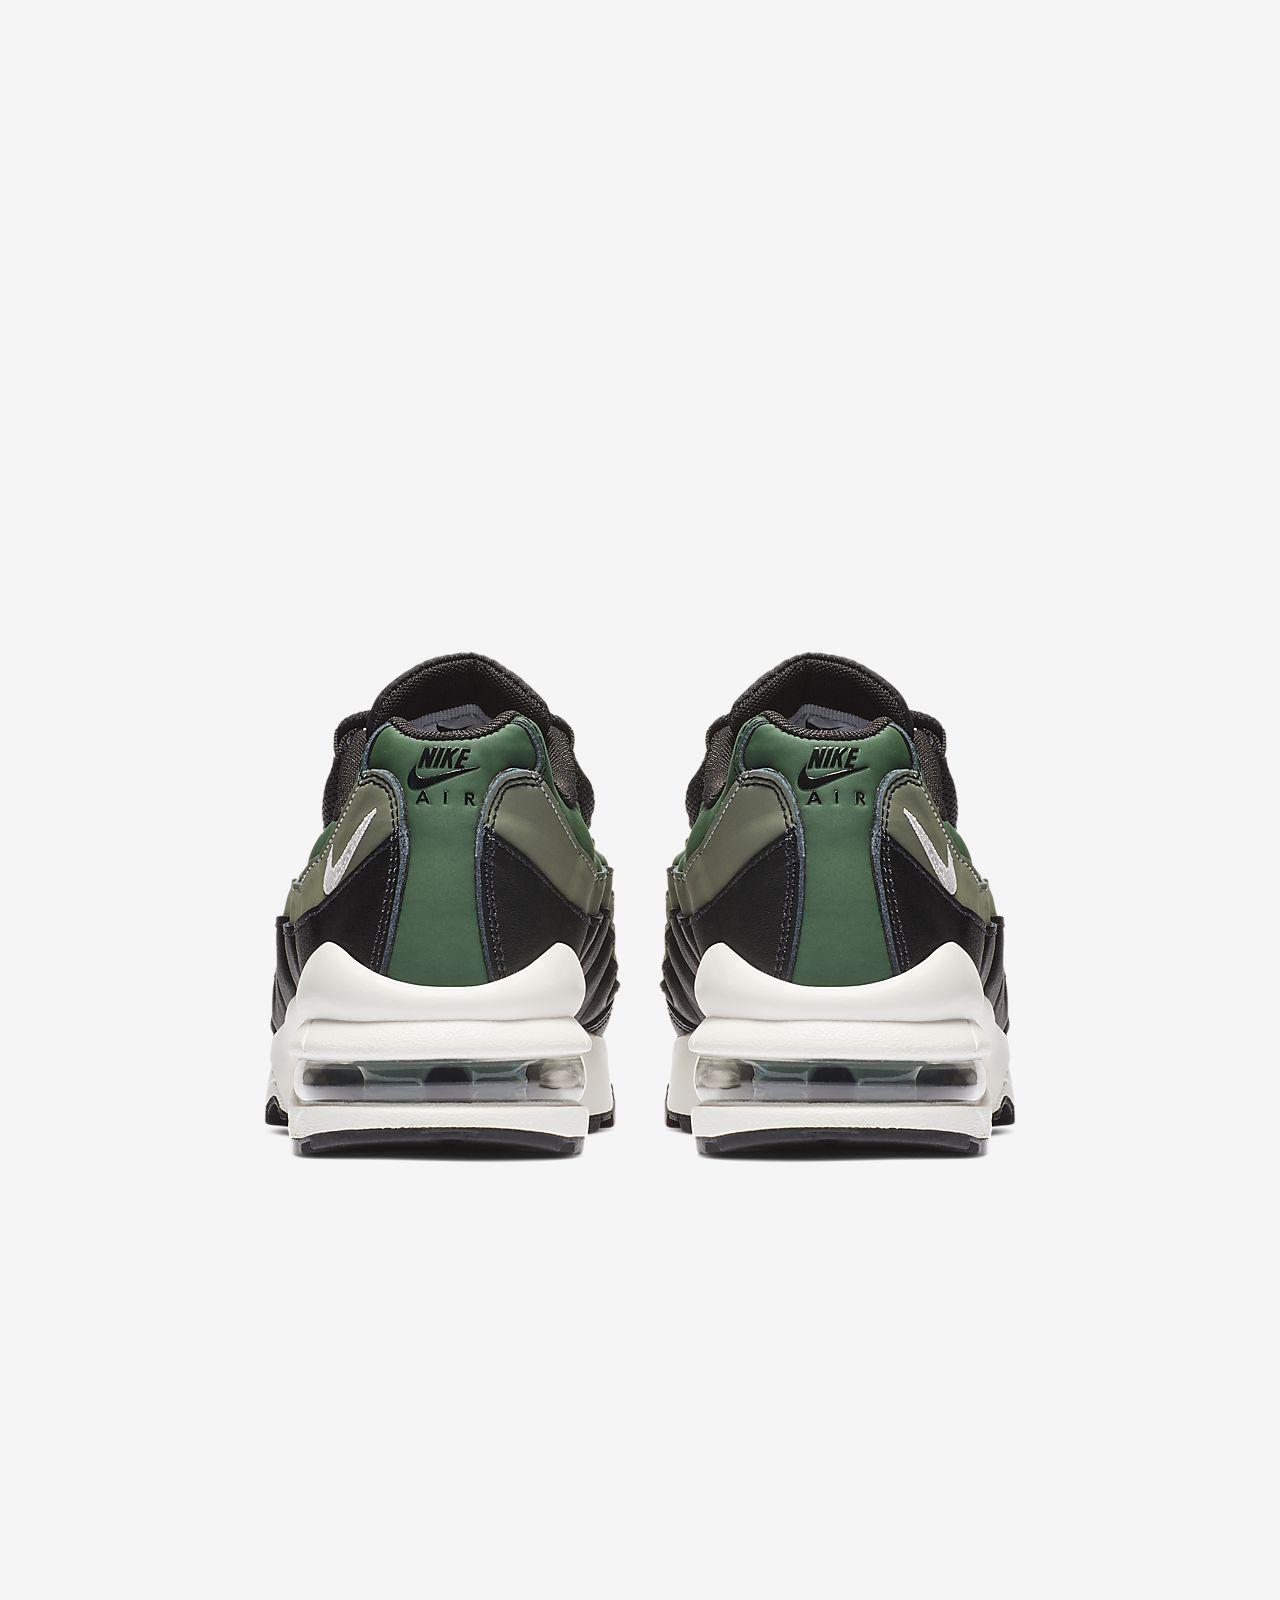 online retailer f6ece a198f ... Nike Air Max 95 Big Kids  Shoe